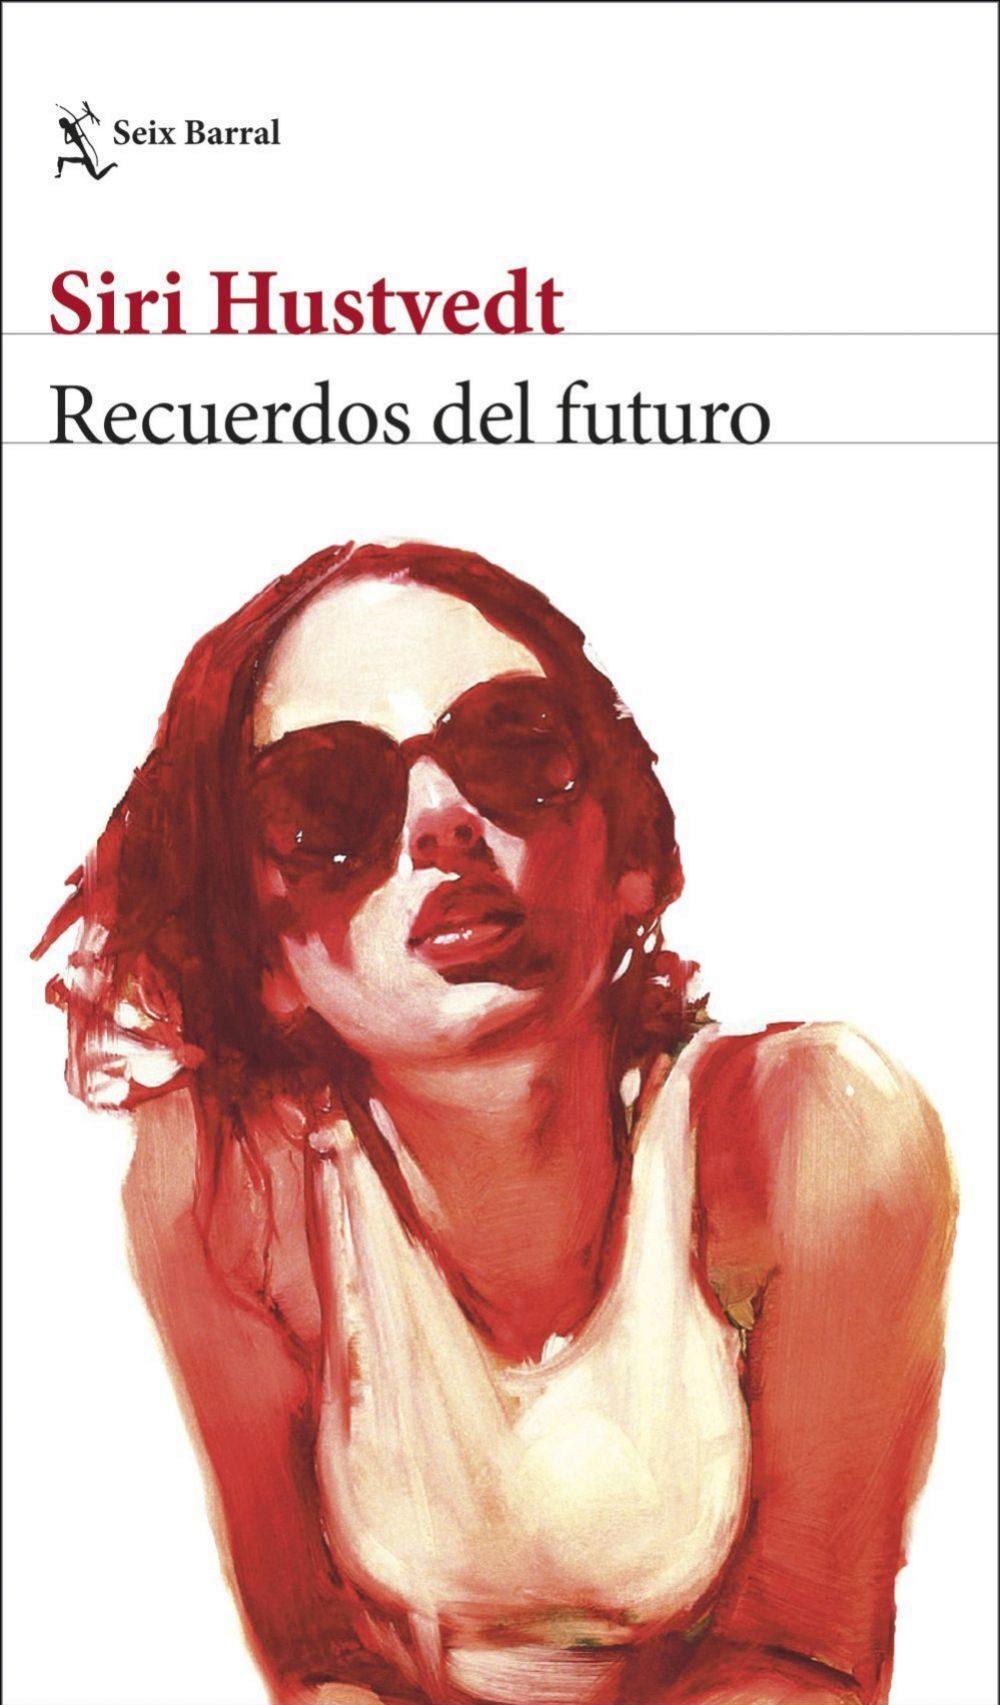 Recuerdos del futuro, la última novela de Siri Husvedt